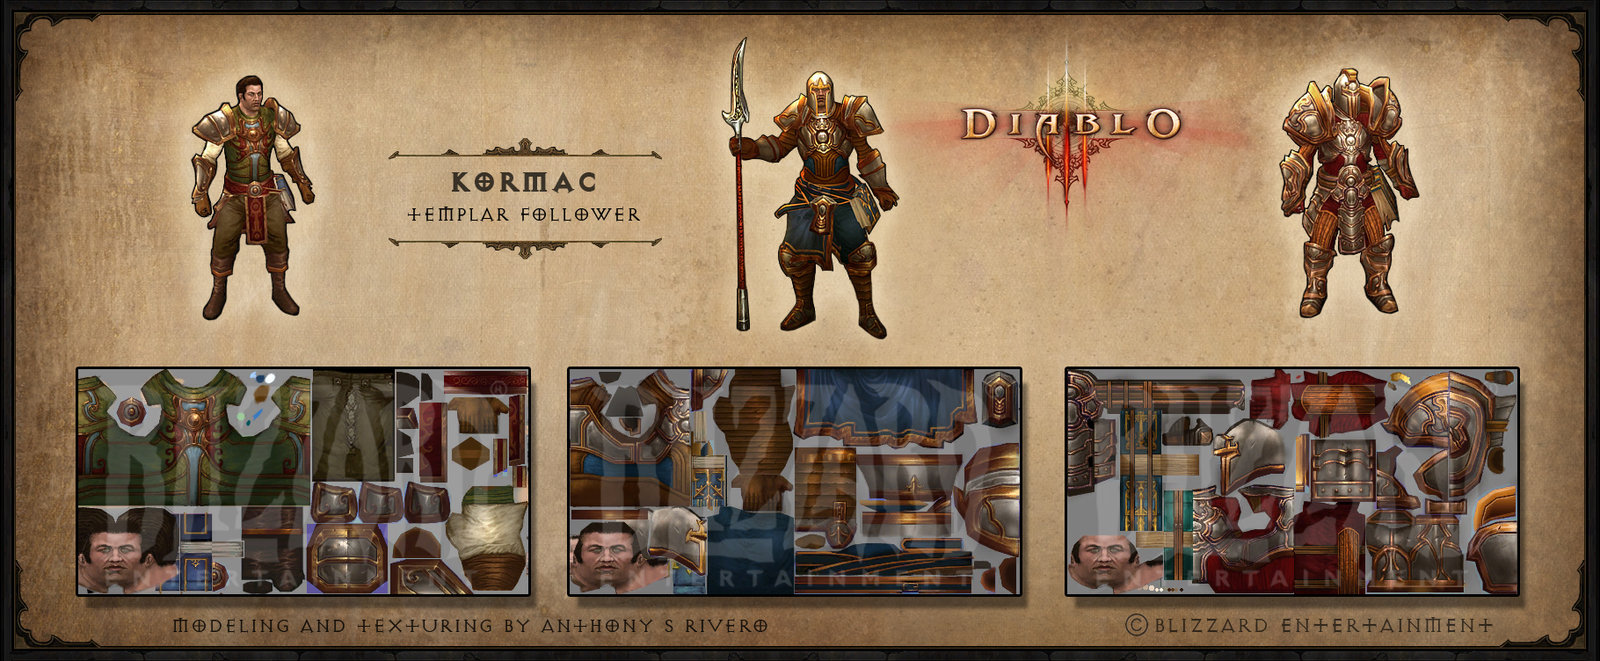 Diablo 3 Kormac